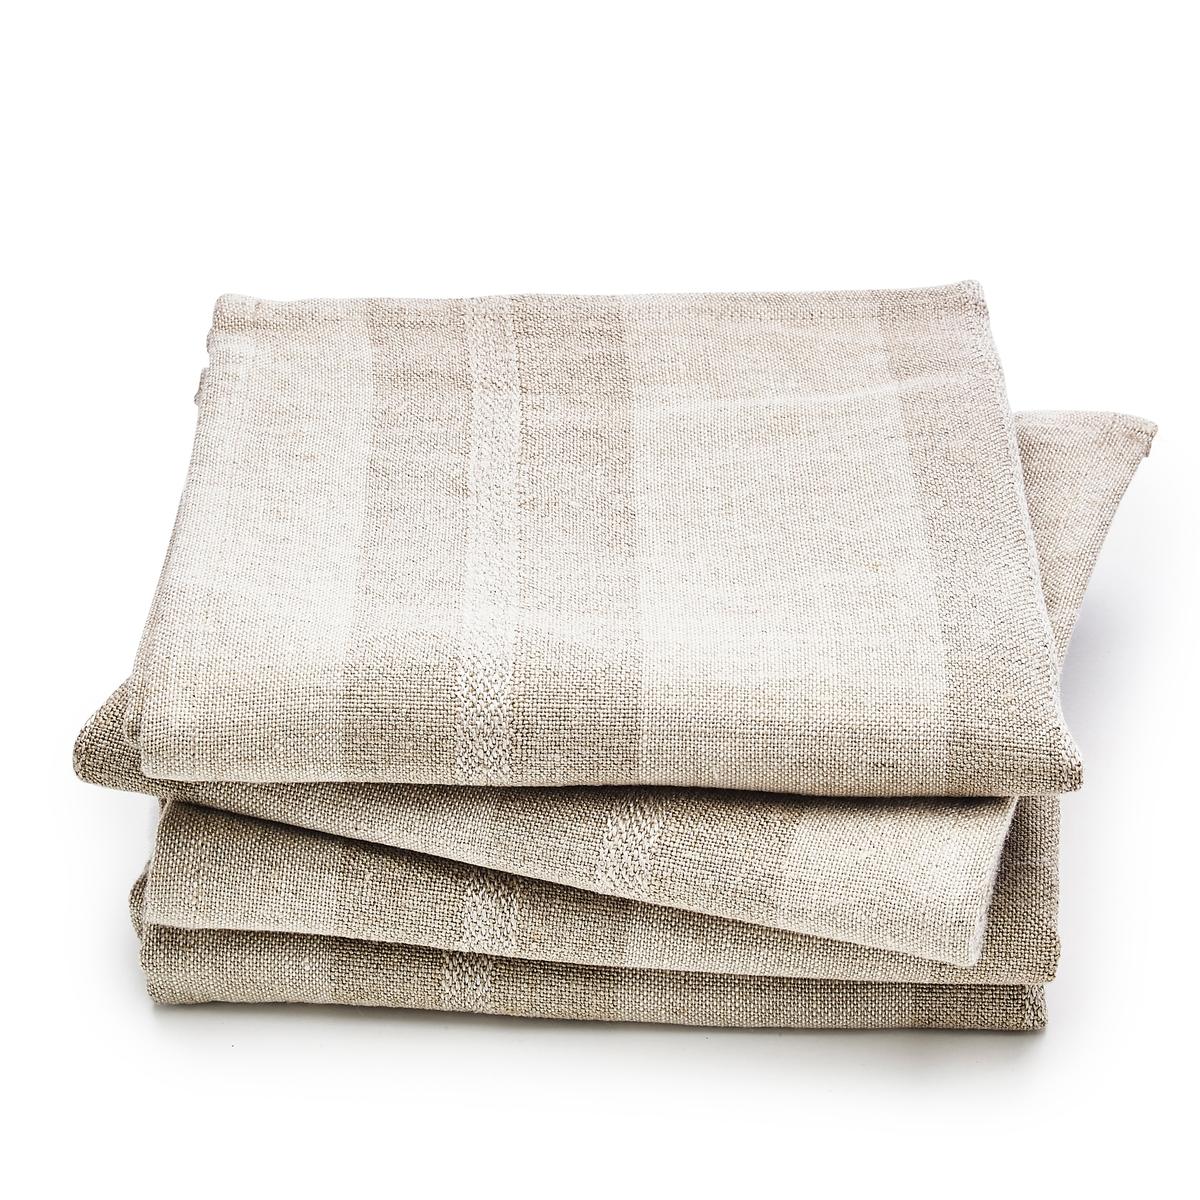 4 салфетки для стола из льна, Monodie